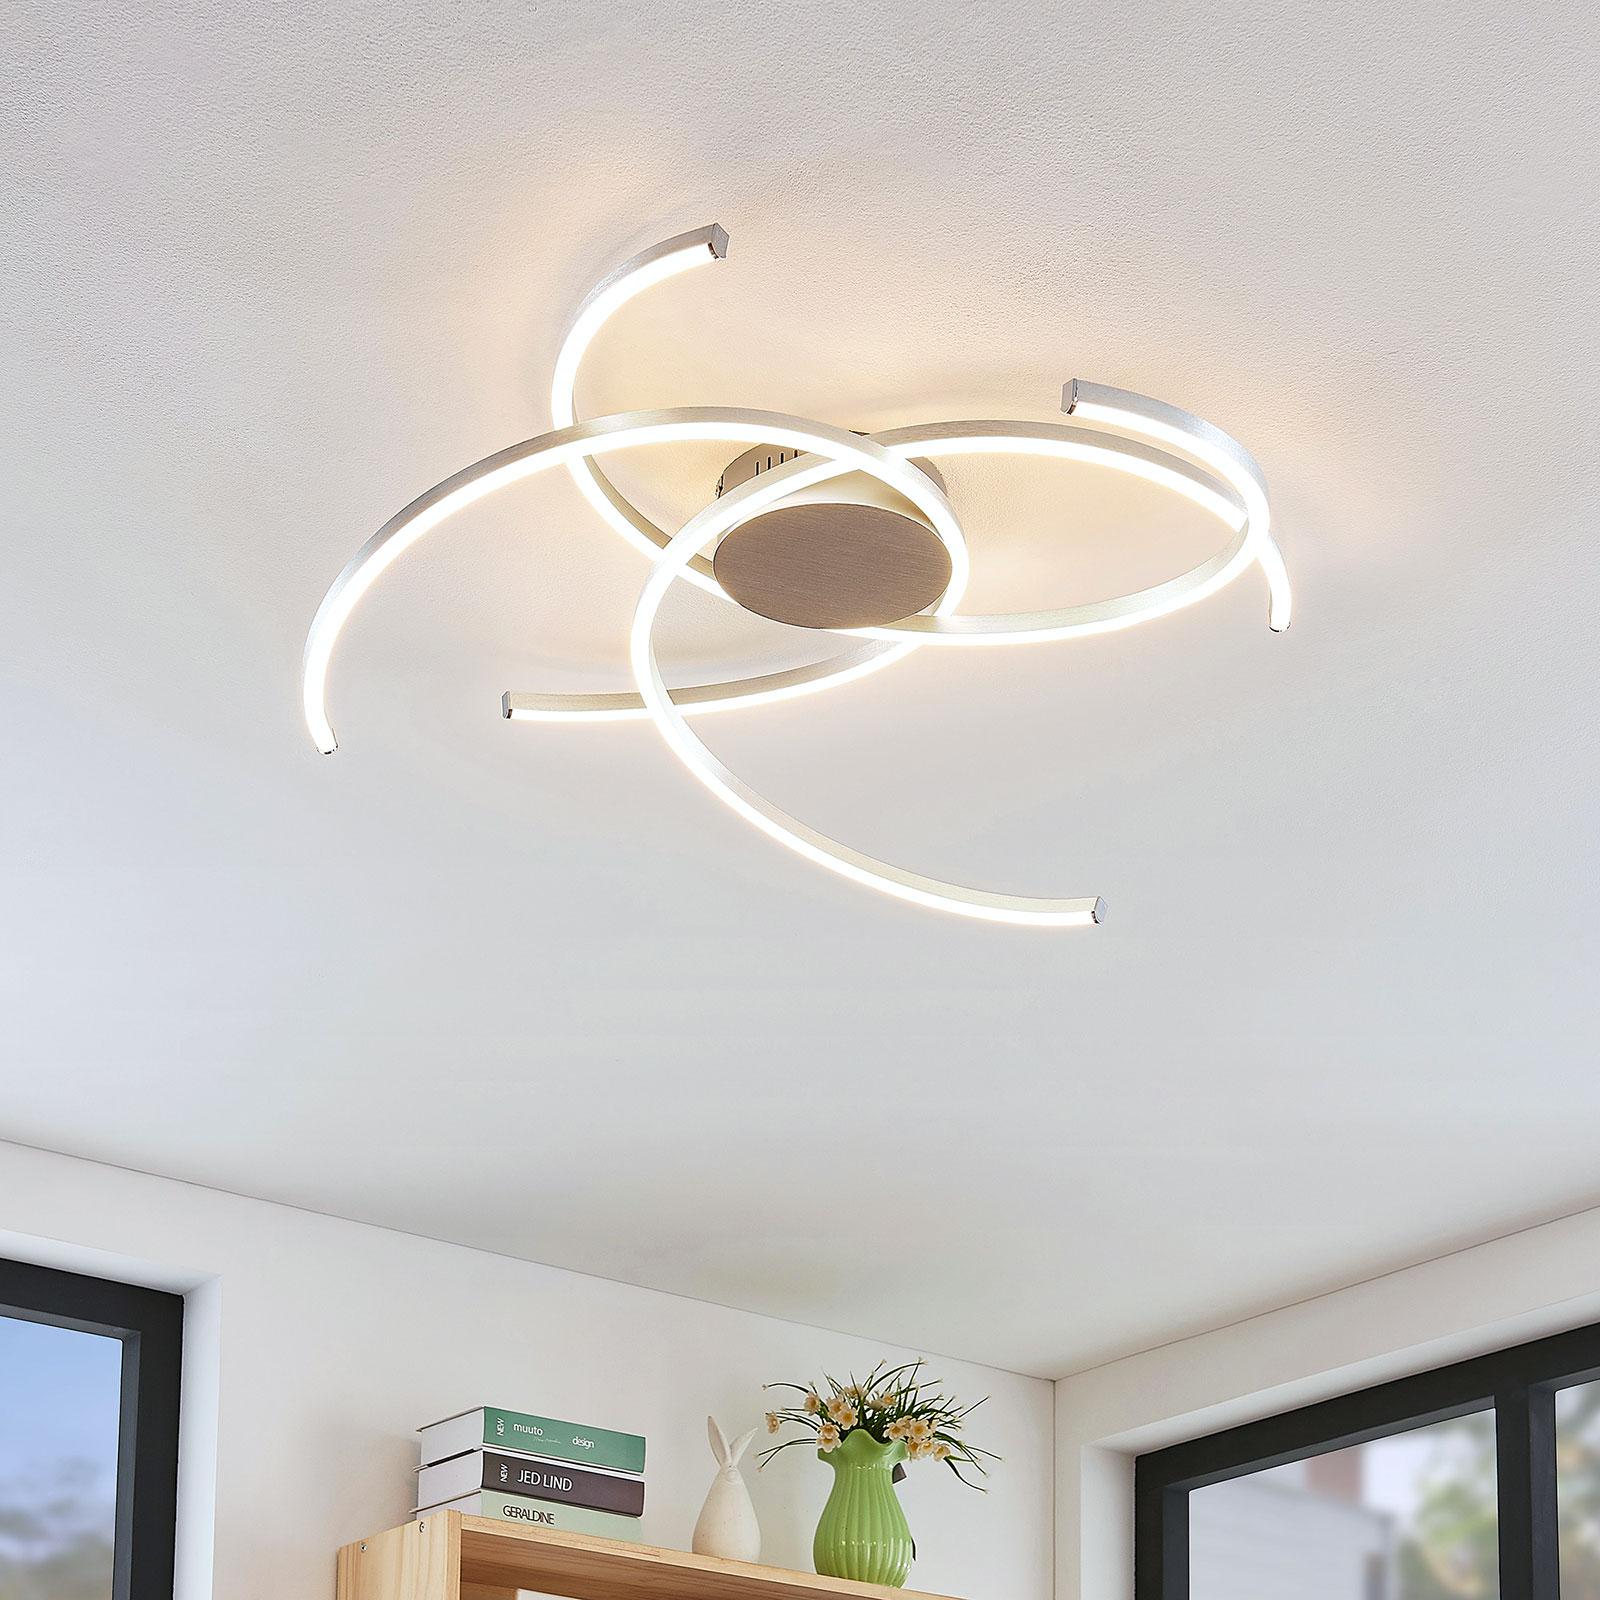 Lindby Katris LED-Deckenleuchte, 73 cm, alu